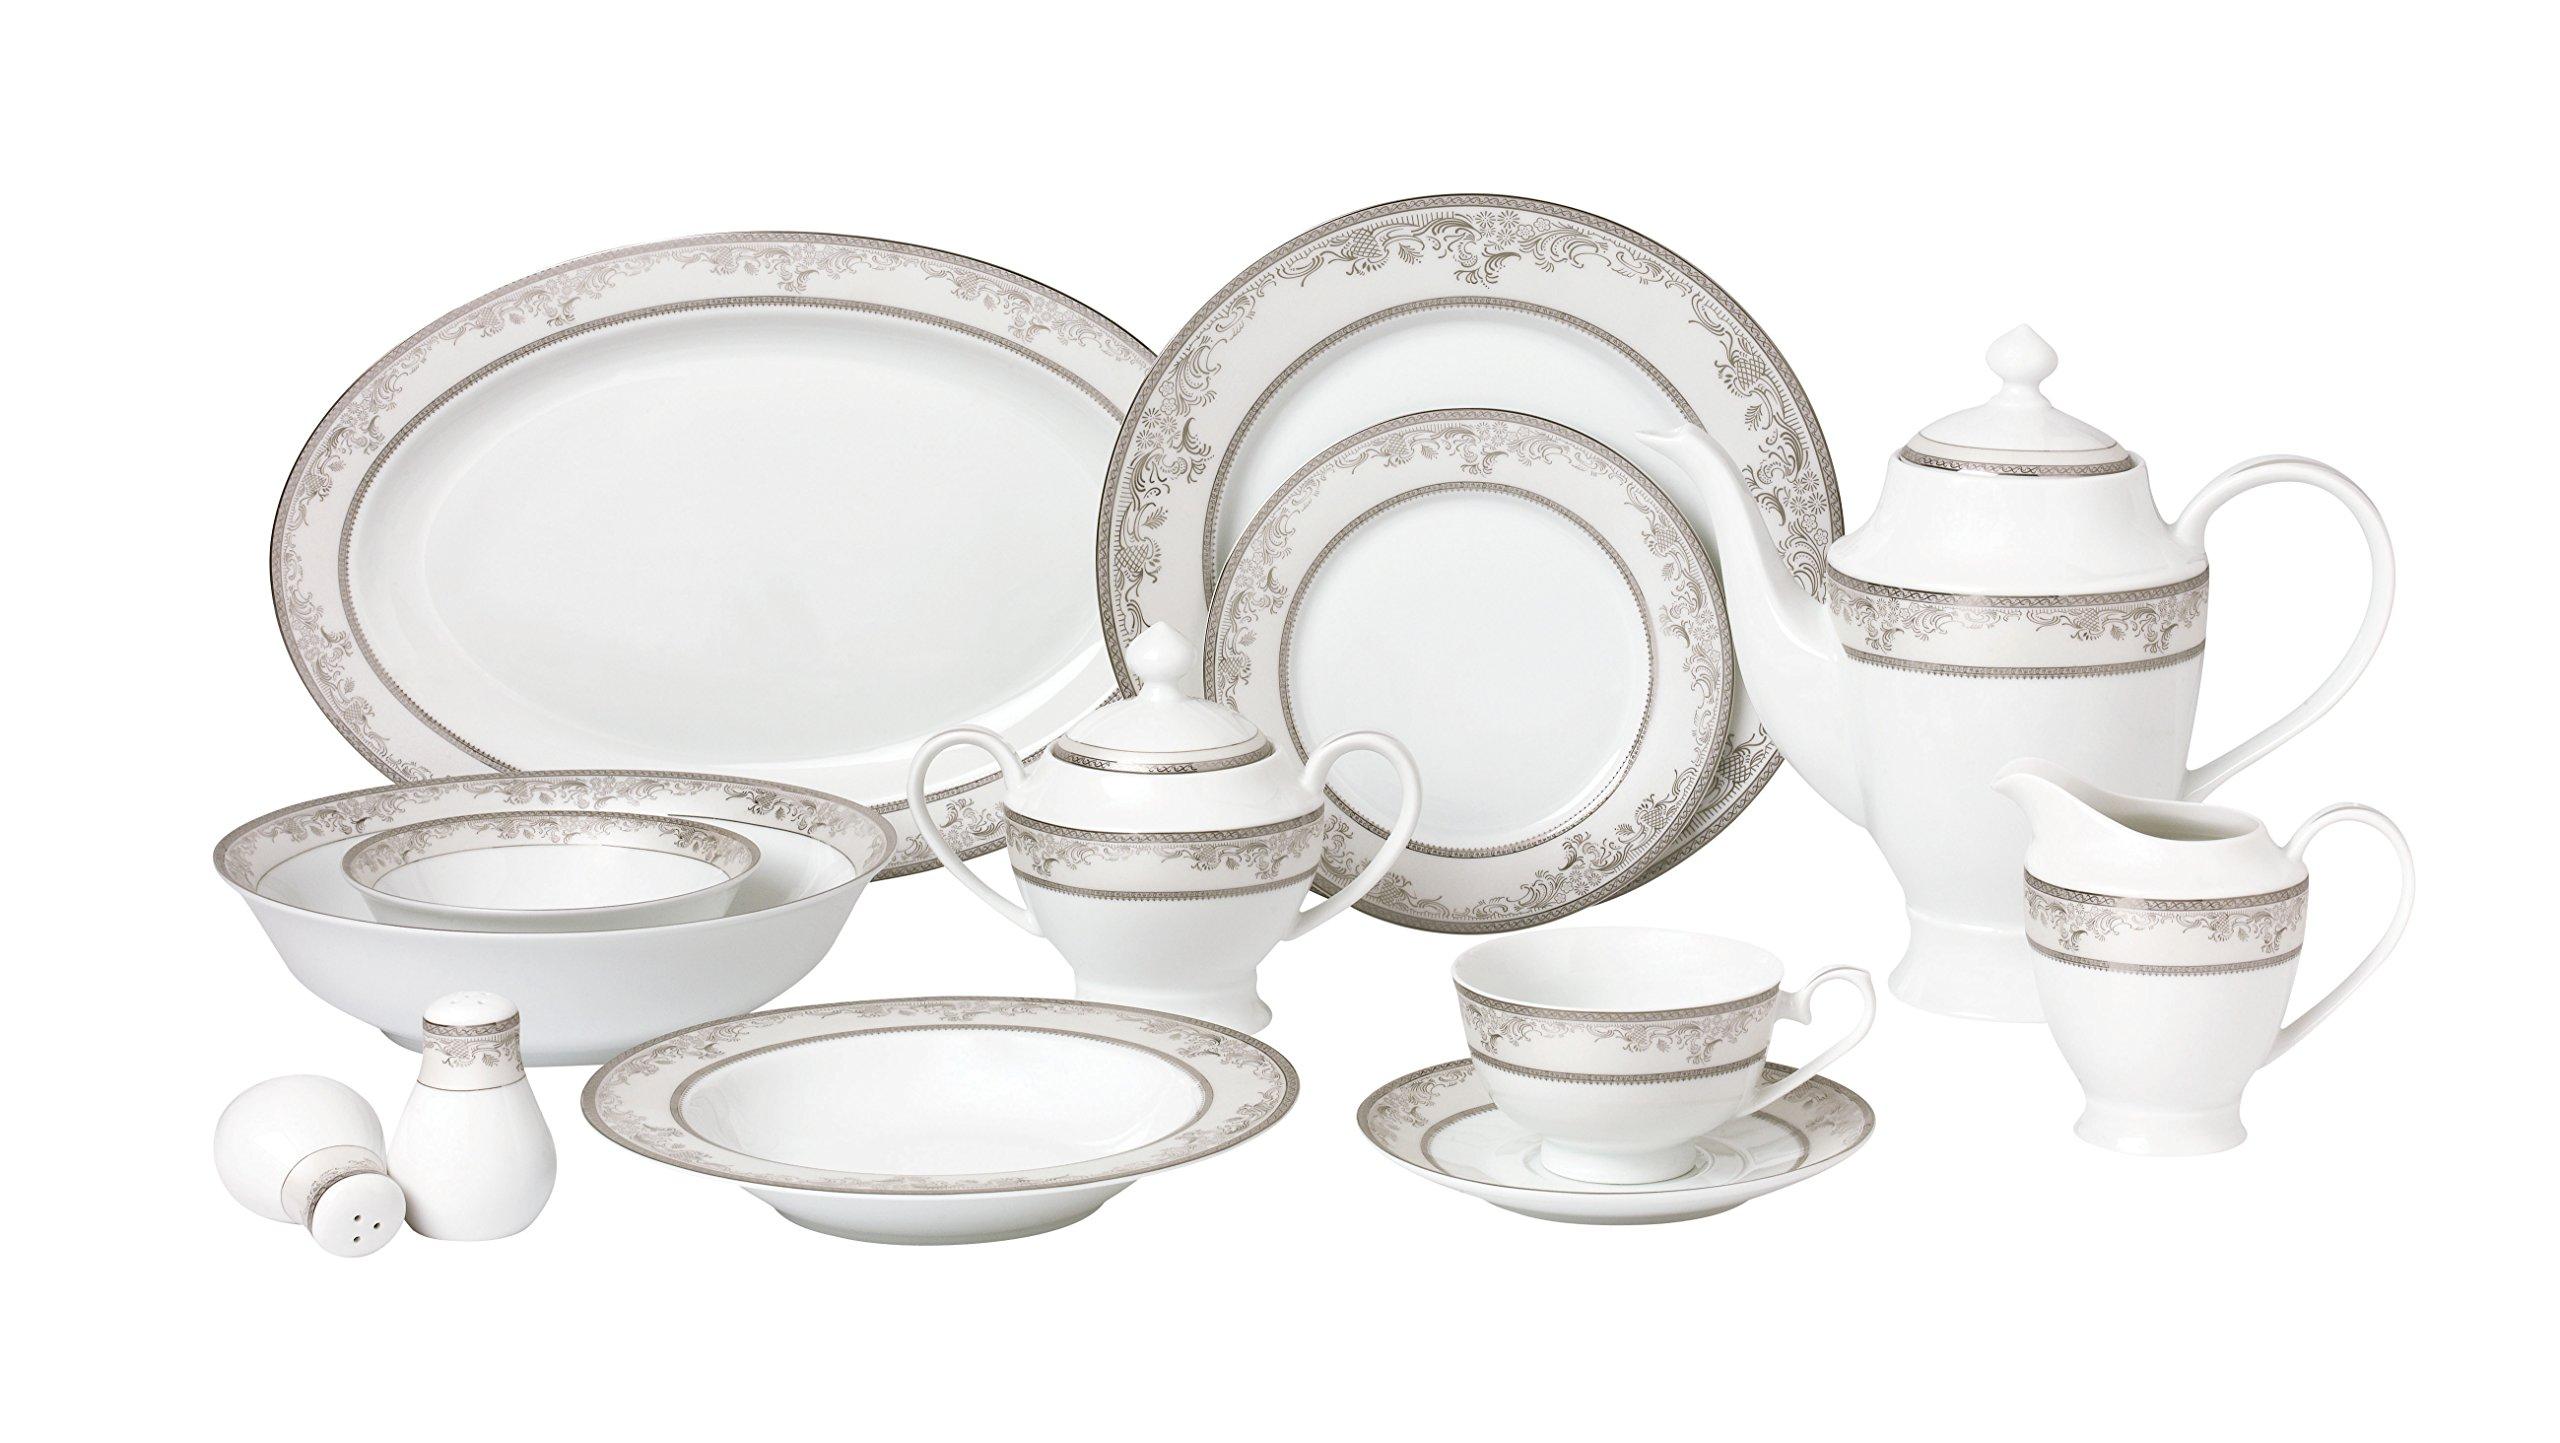 Lorren Home Trends 57 Piece 'Juliette' Bone China Dinnerware Set (Service for 8 People), Silver